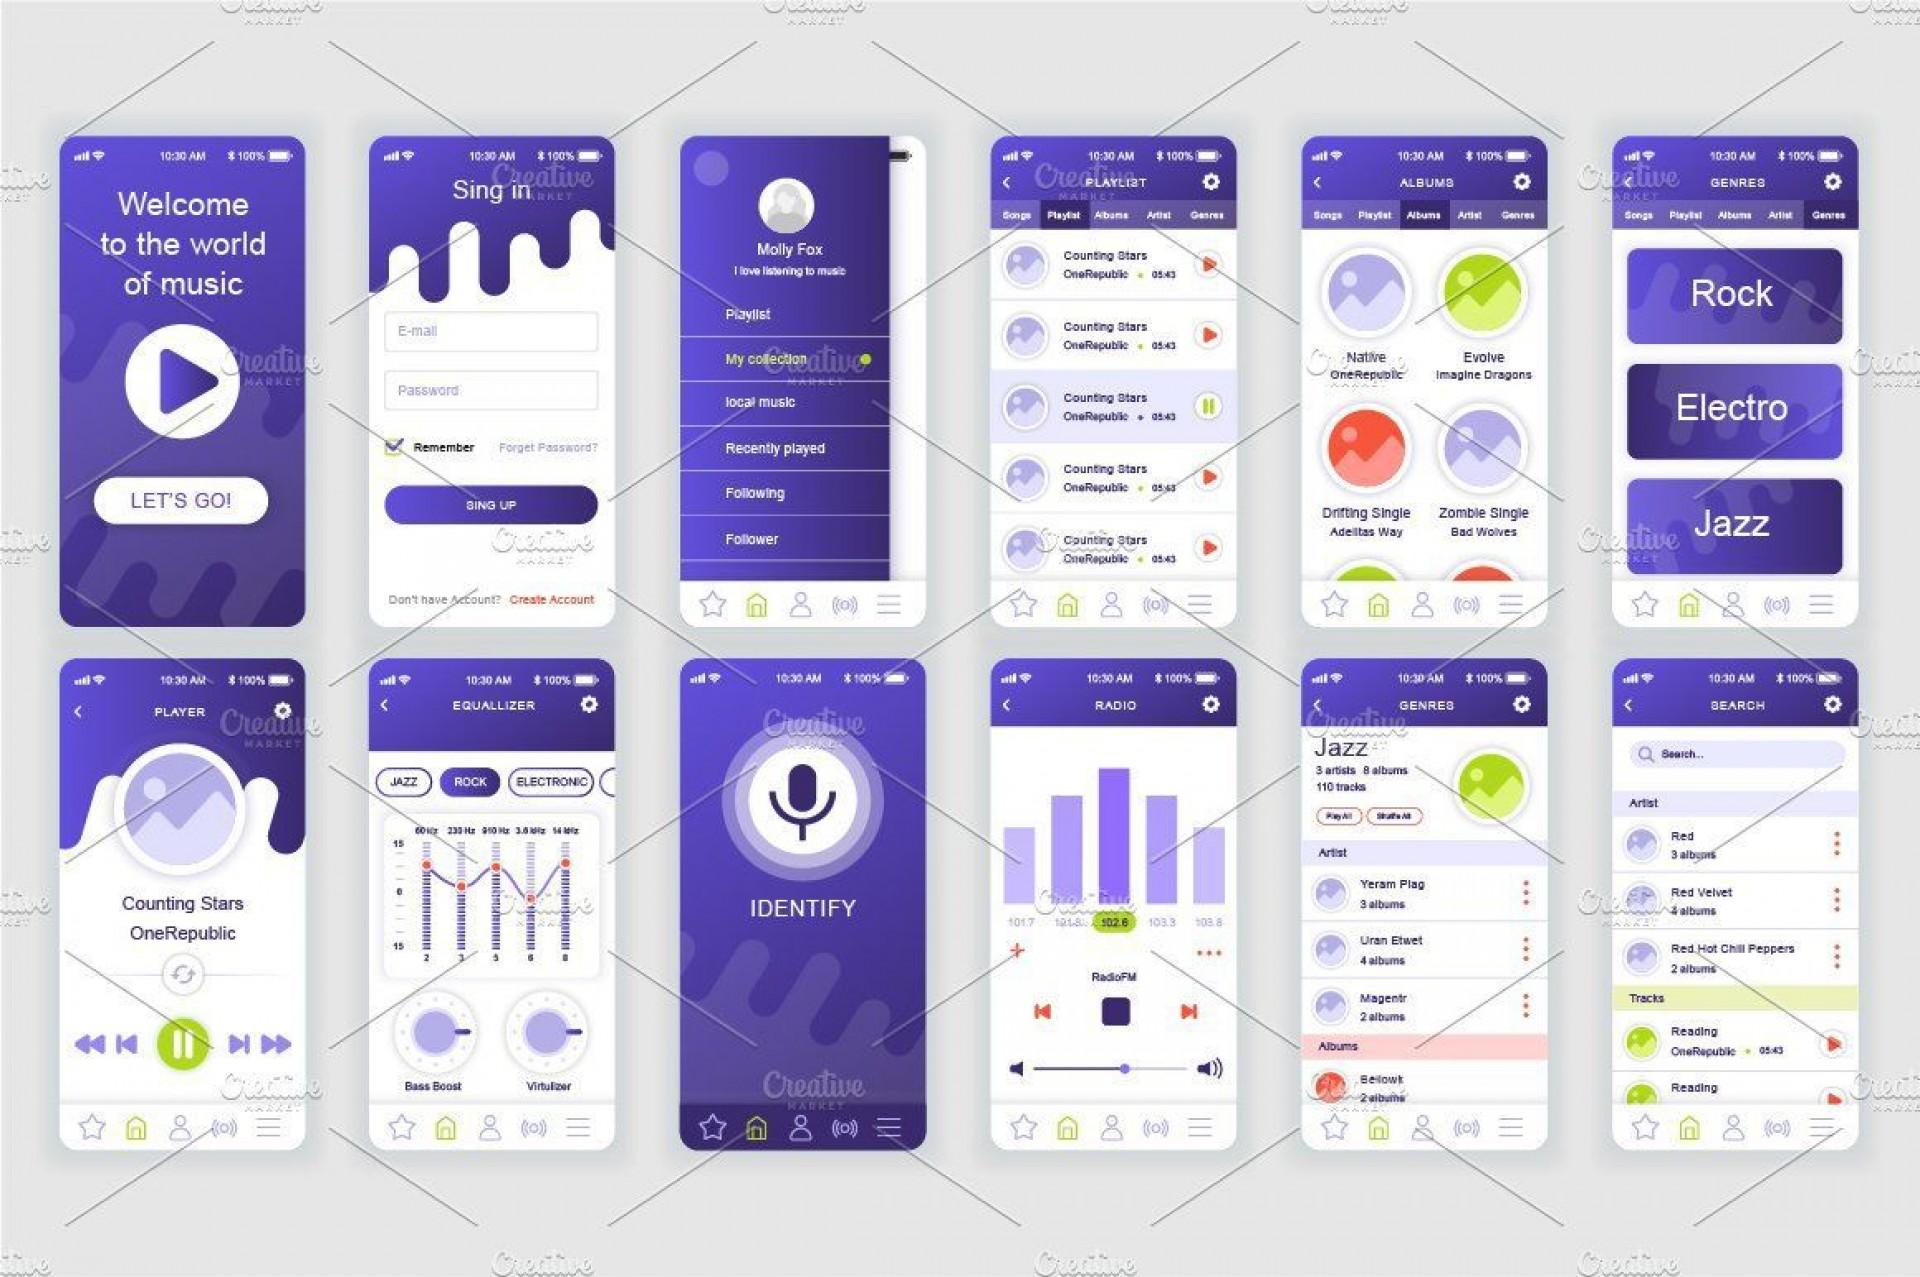 002 Sensational Mobile App Design Template Inspiration  Size Free Download Ui Psd1920